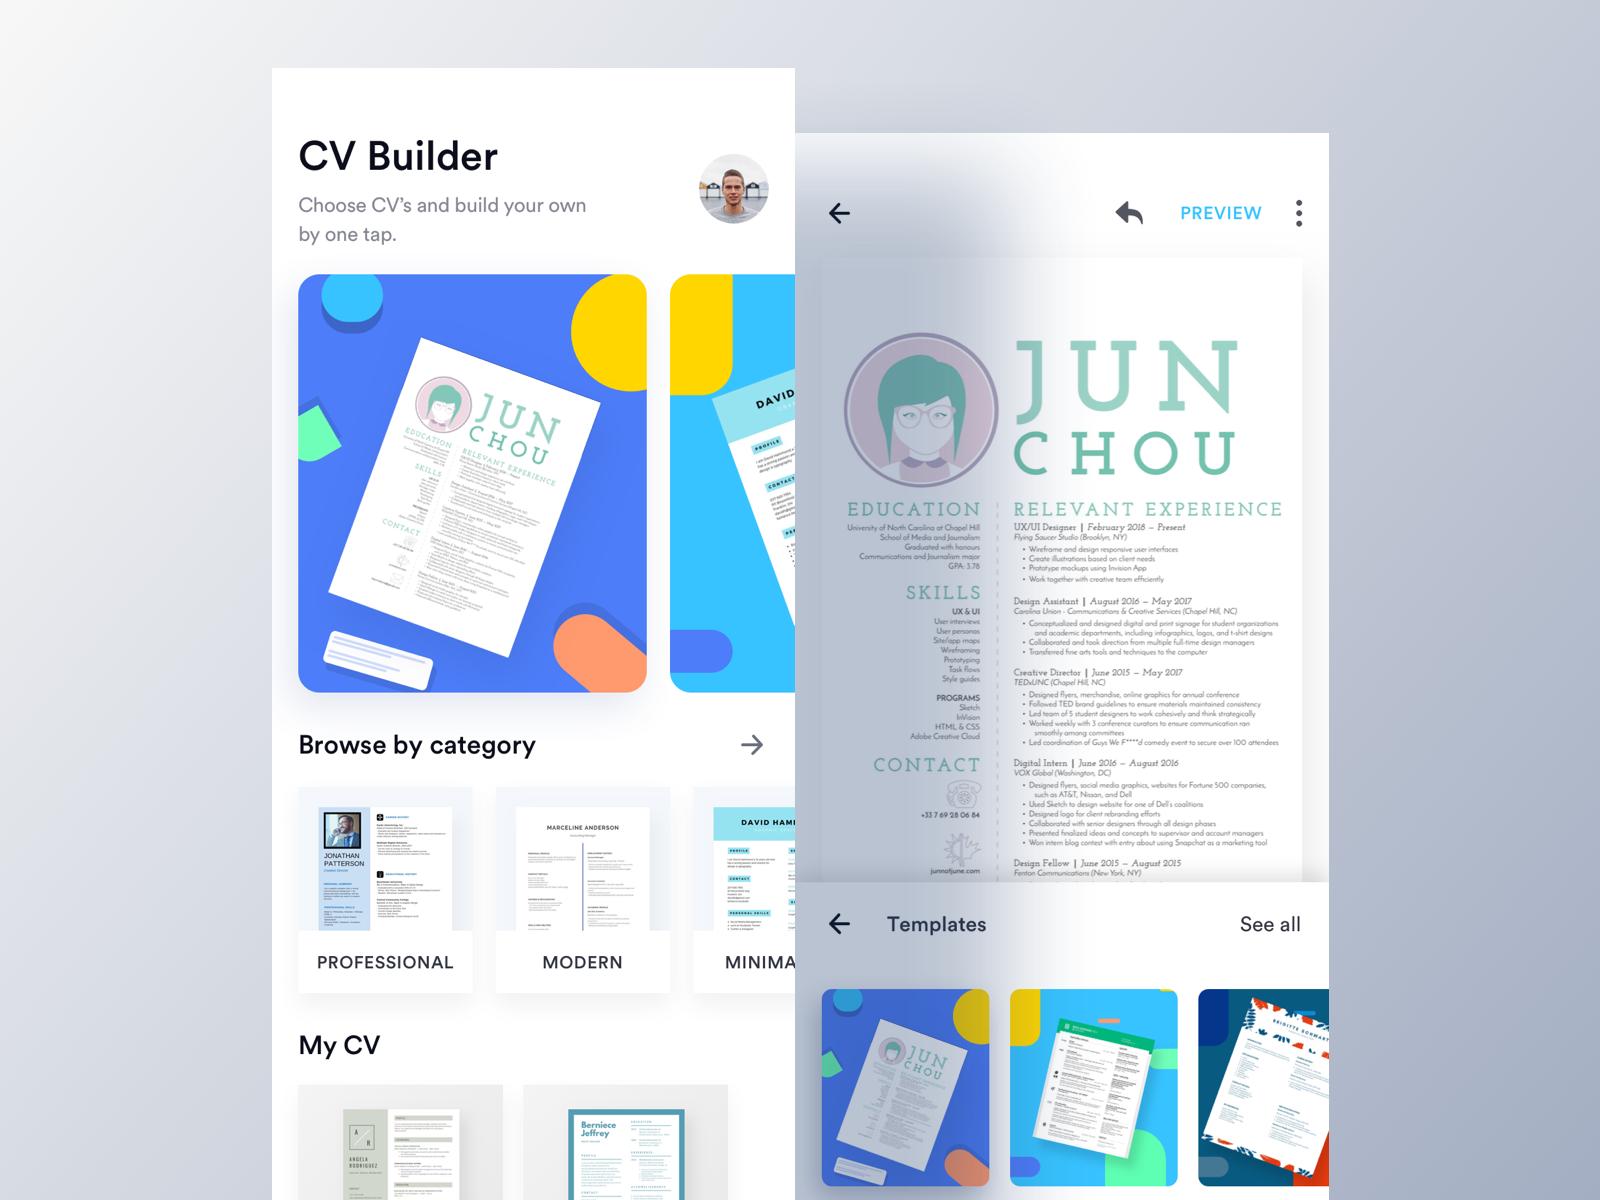 EZY - CV Builder App (Home & Editor) by Luova Studio on Dribbble